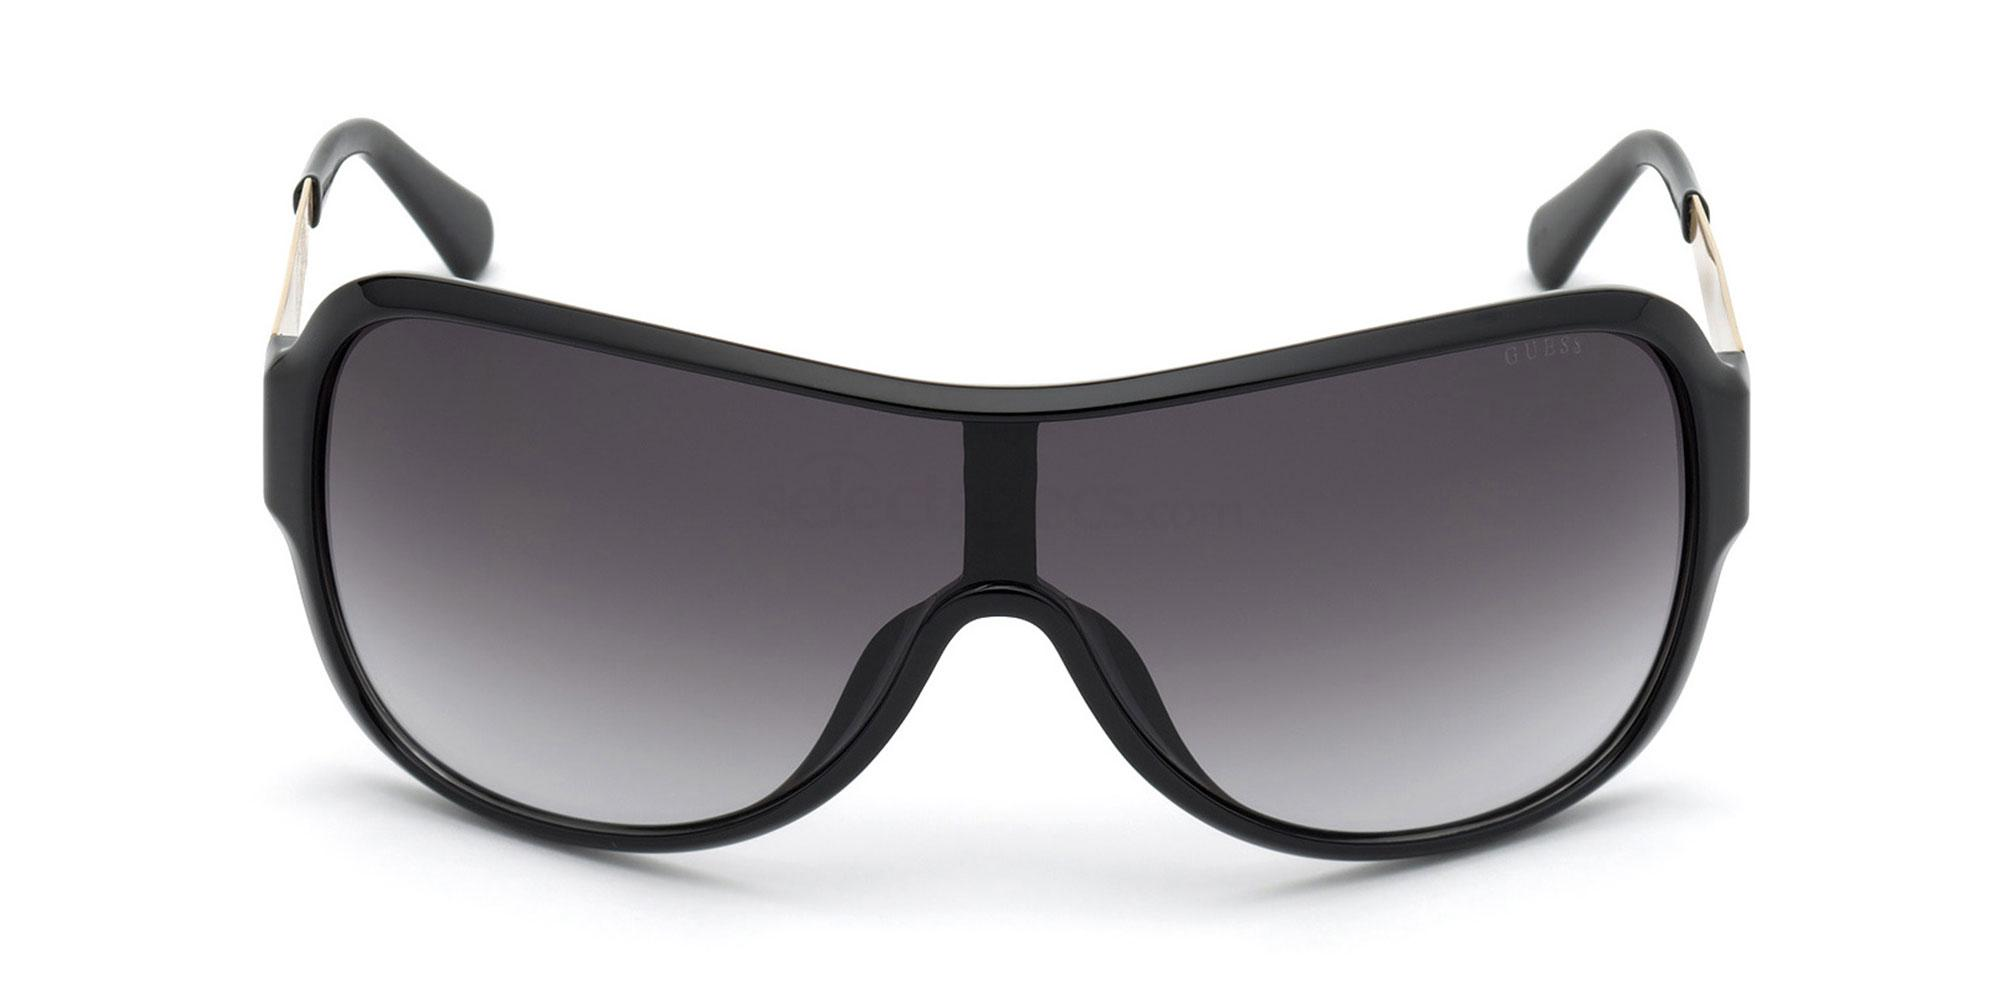 01B GU6975 Sunglasses, Guess